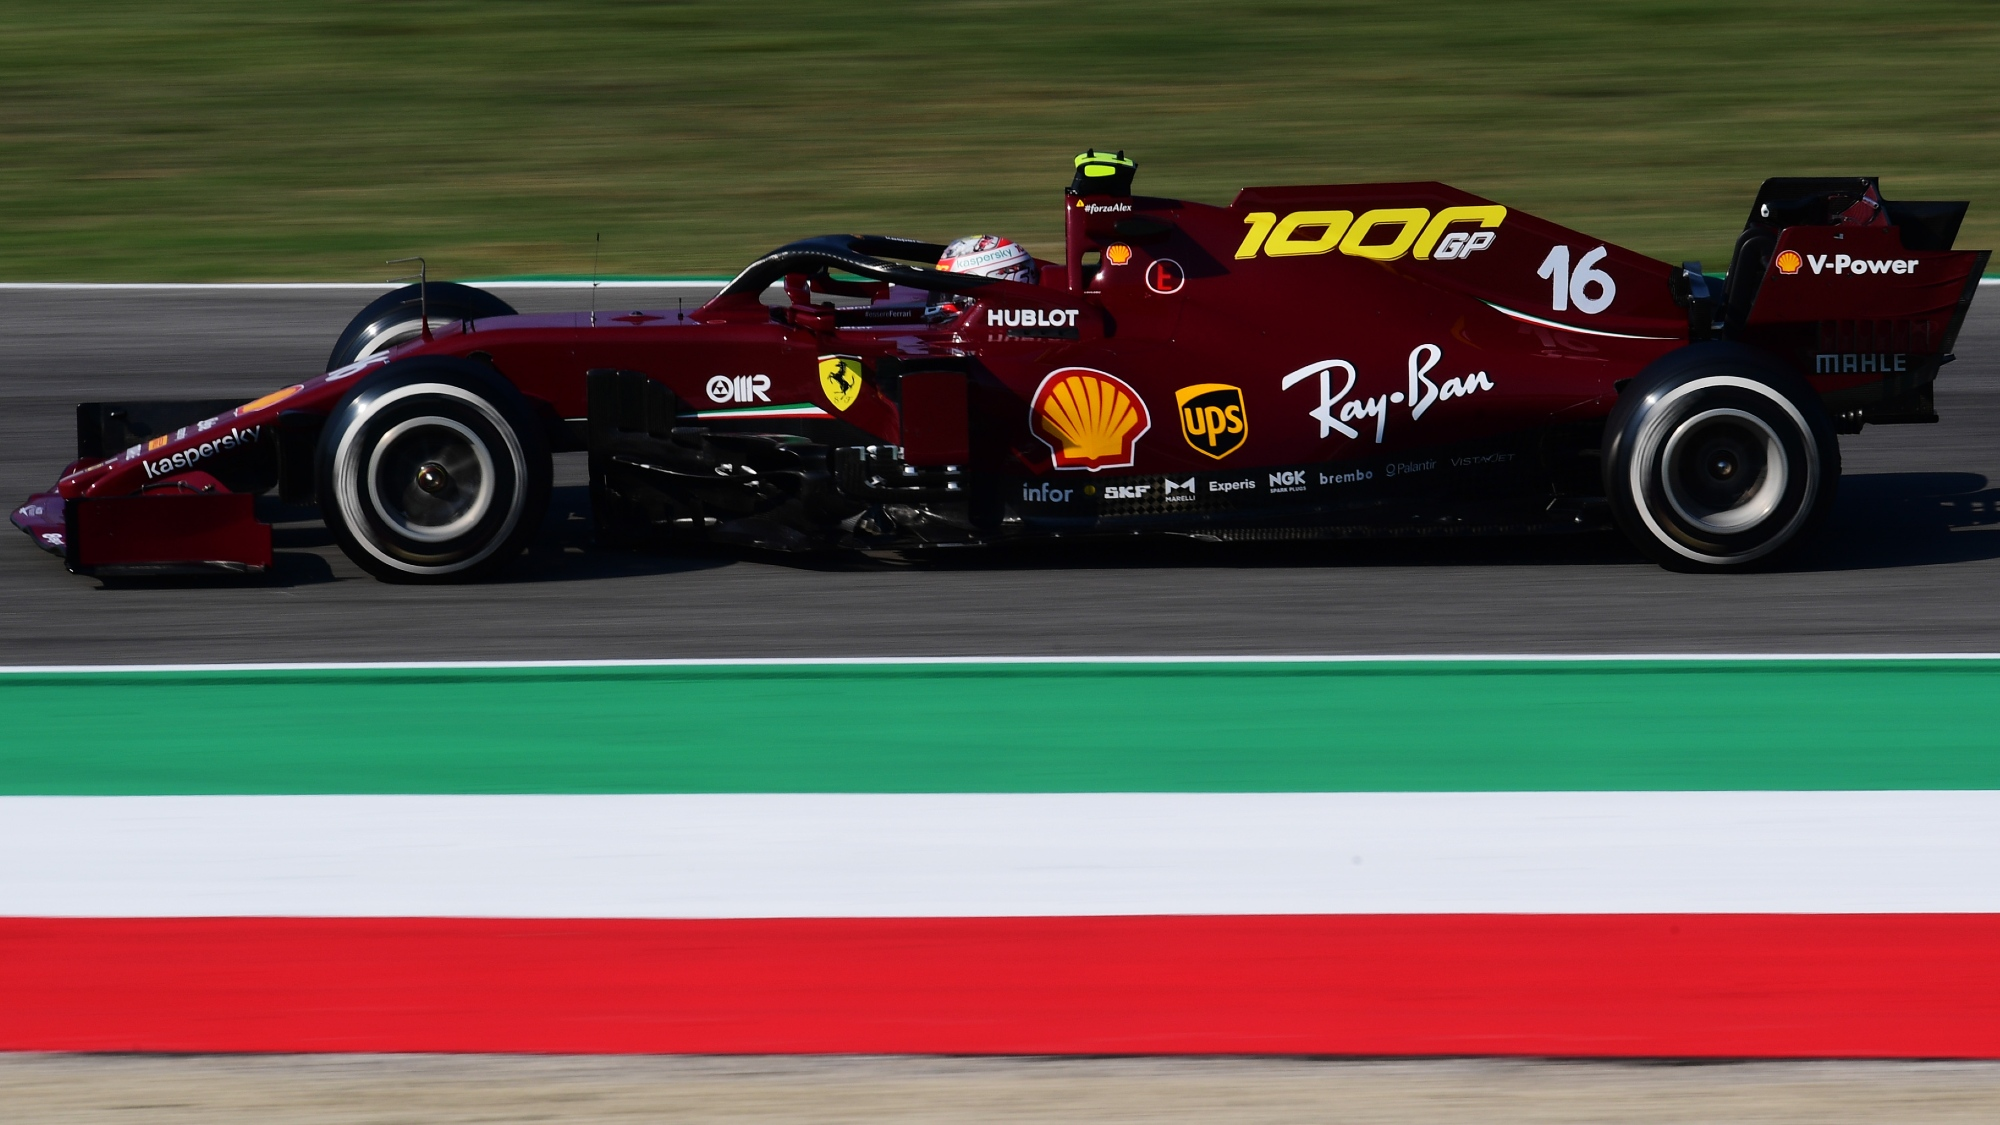 Charles Leclerc, 2020 Tuscan GP